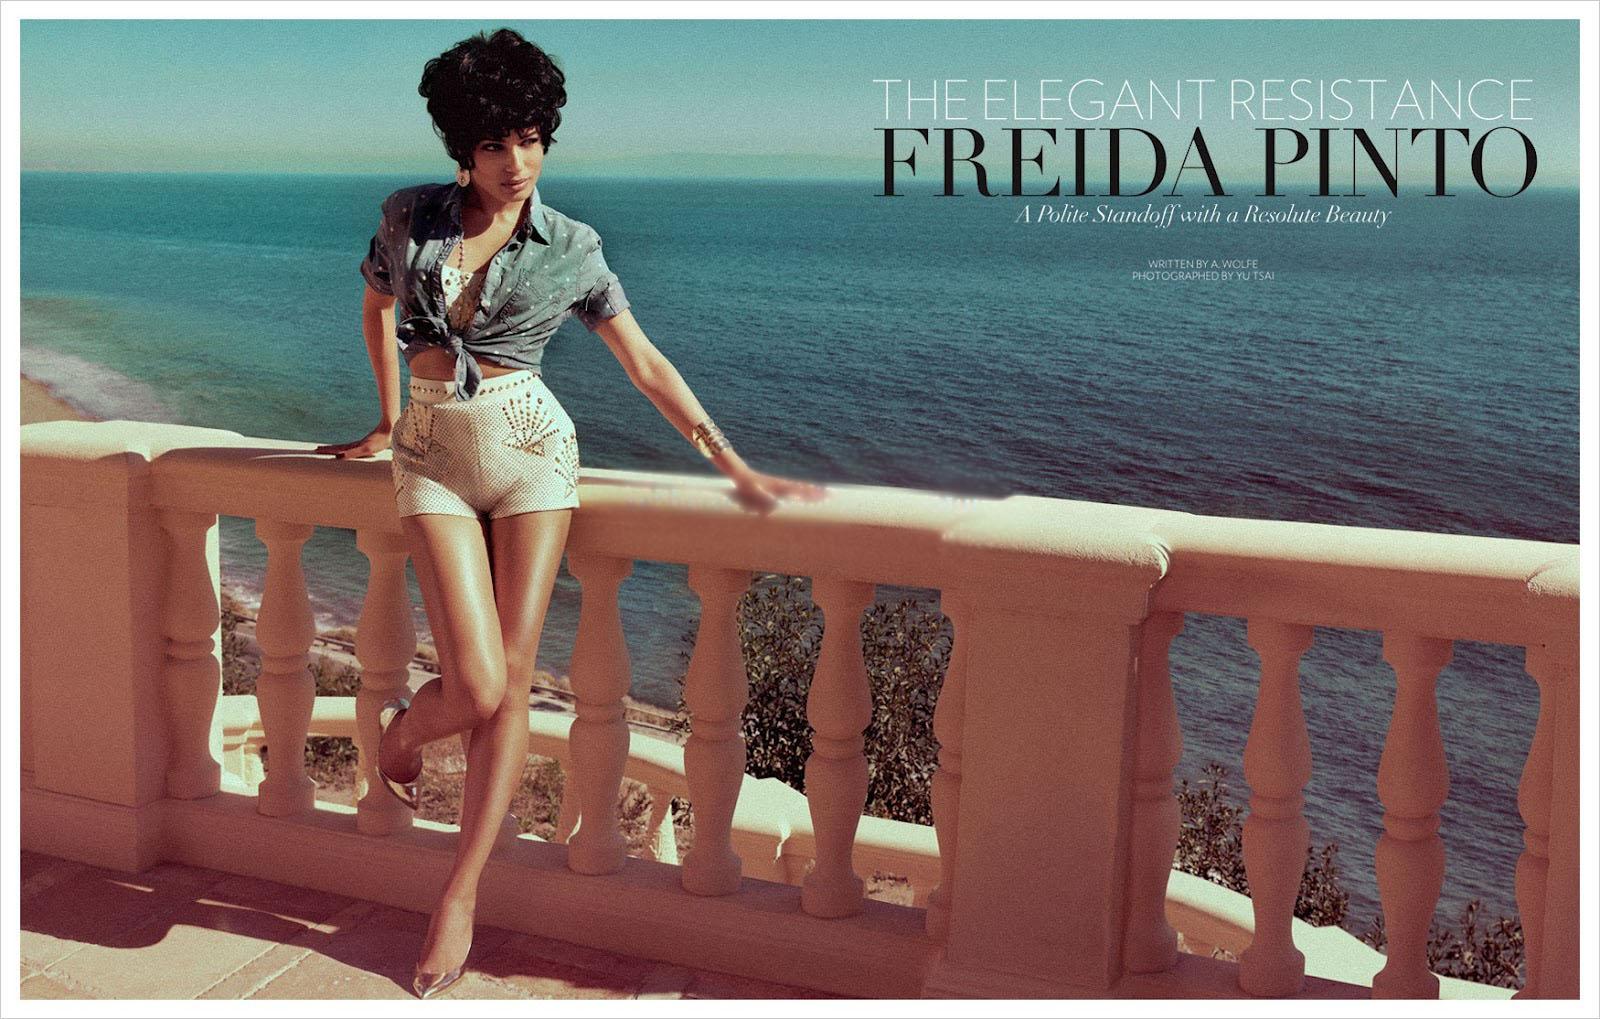 http://3.bp.blogspot.com/-krv7IIuFps4/T9WJJCOx-eI/AAAAAAAAxTE/Vc9CyijsV6s/s1600/freida+pinto+in+shorts+on+magazine+latest+scans+sabhotcom+%284%29.jpg